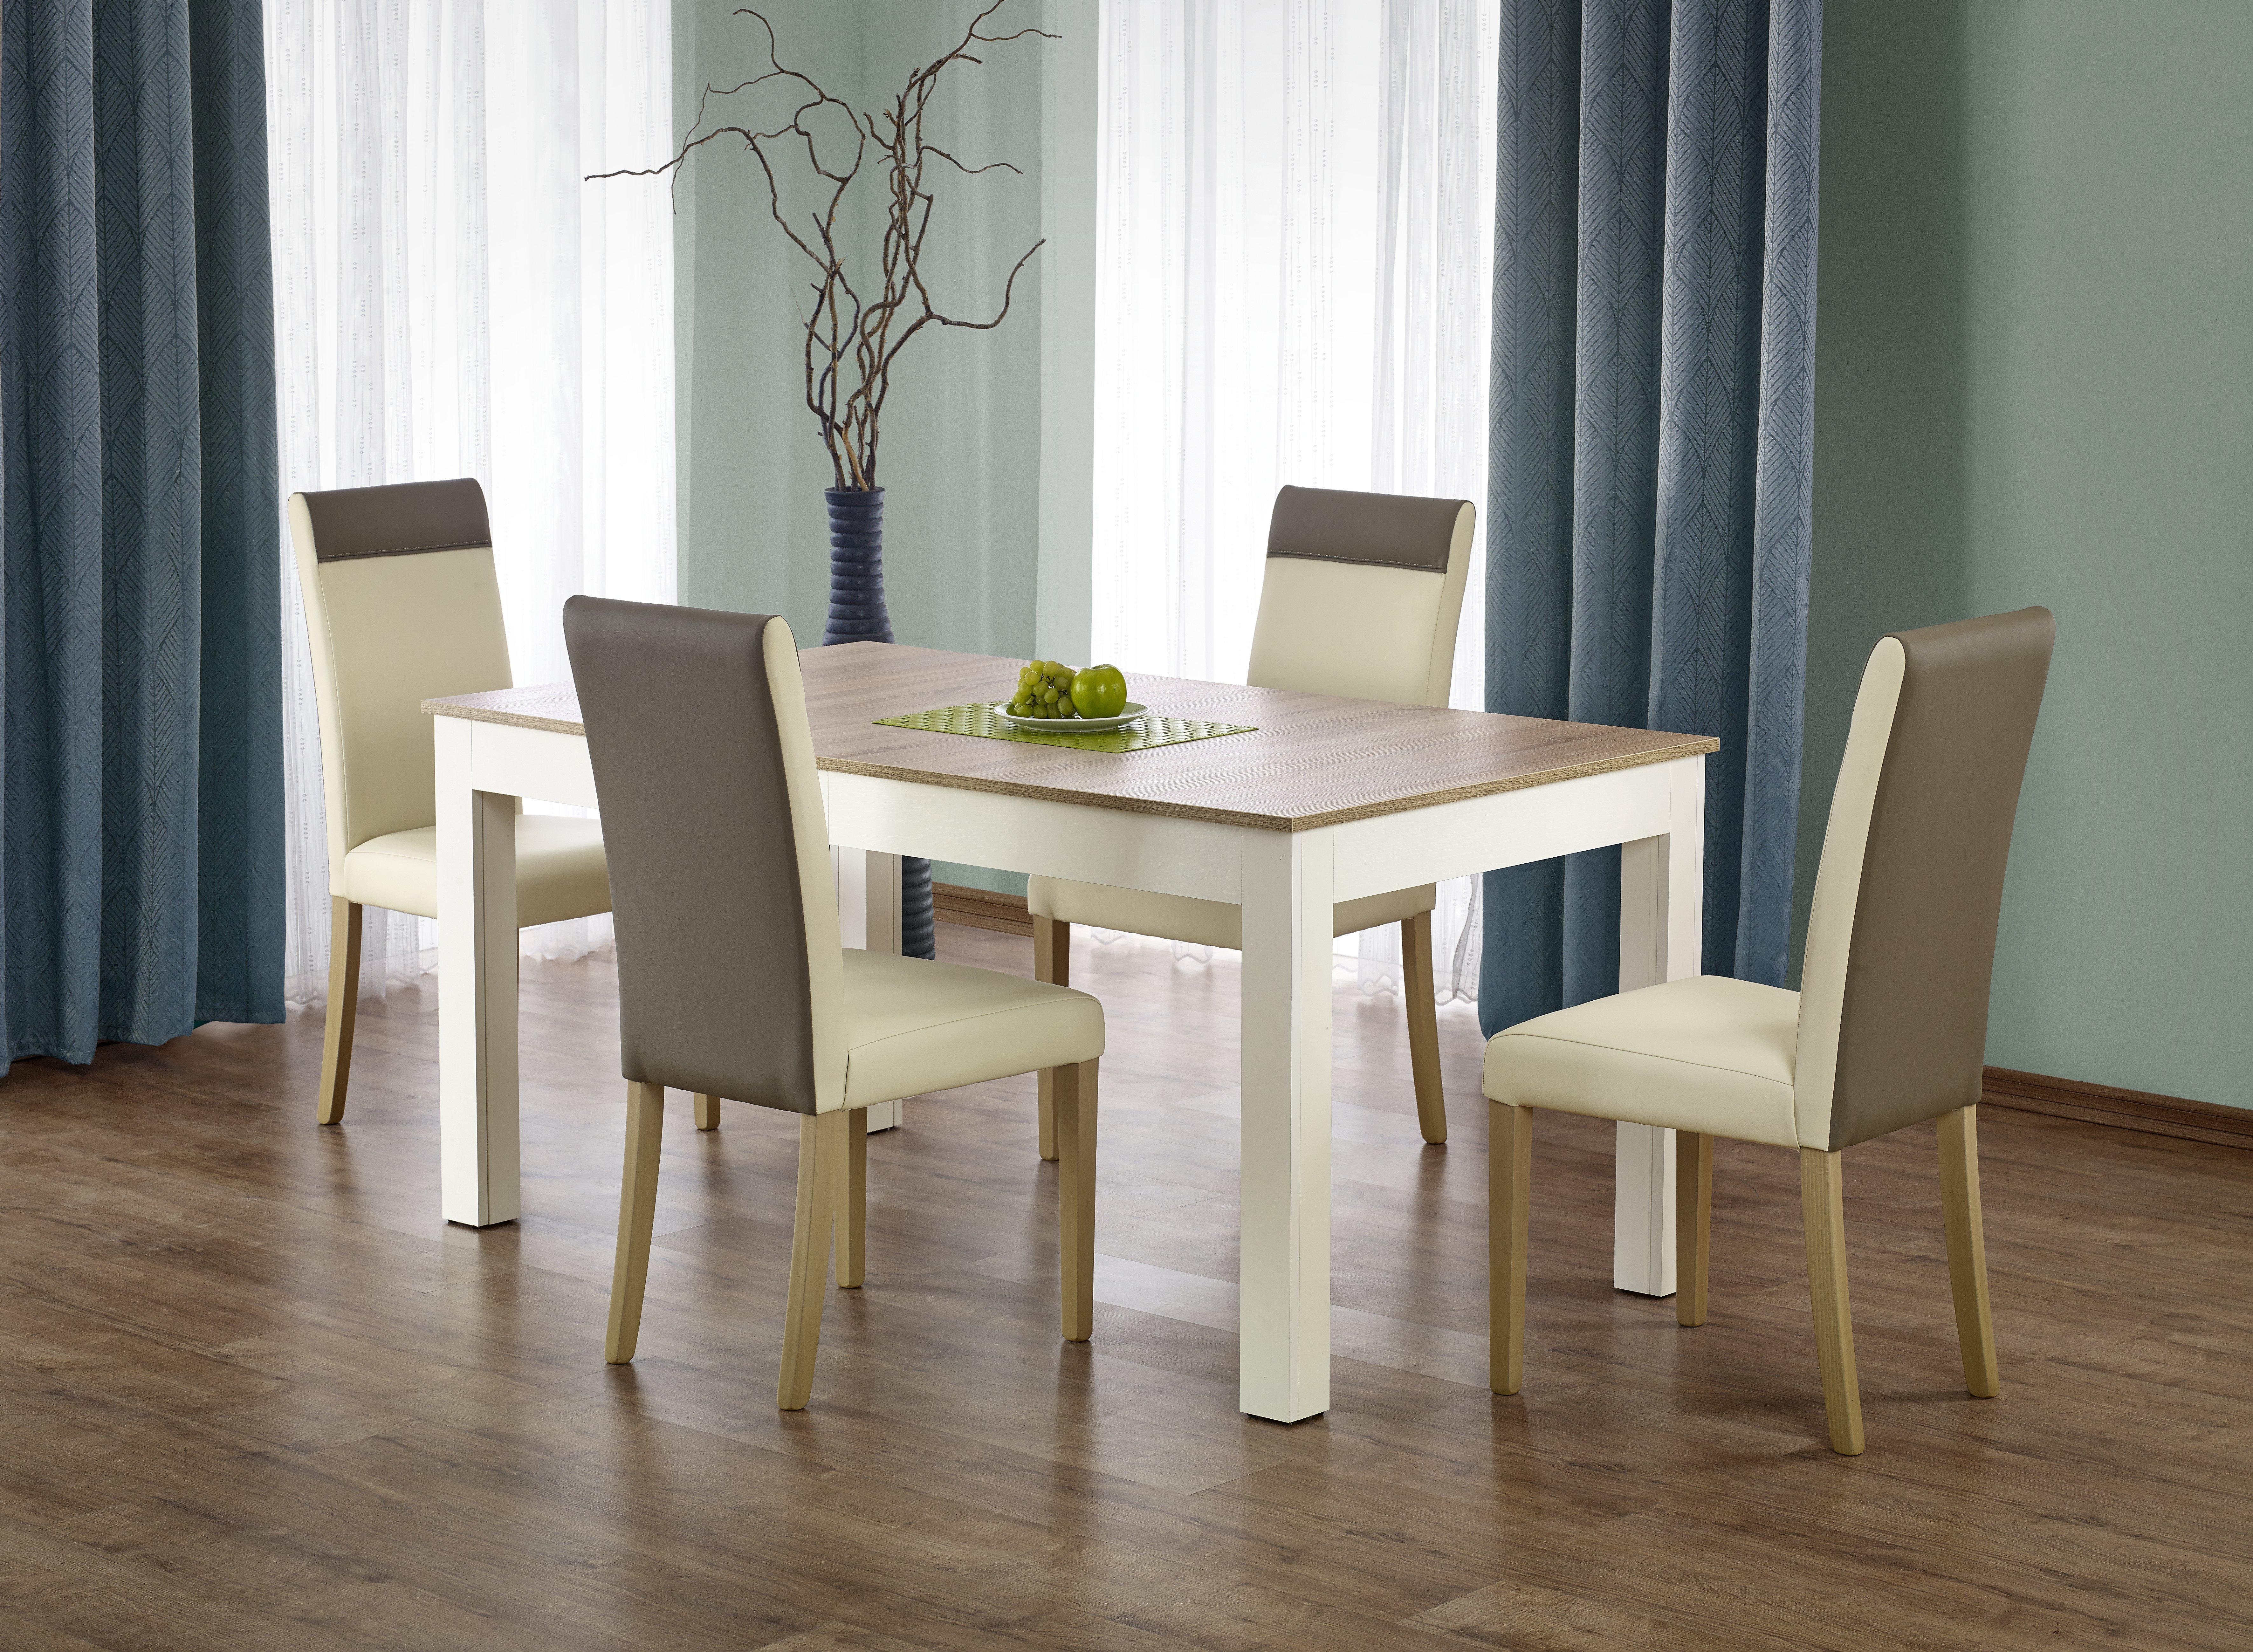 Jídelní stůl - Halmar - Seweryn (dub sonoma + bílá) (pro 6 až 12 osob)